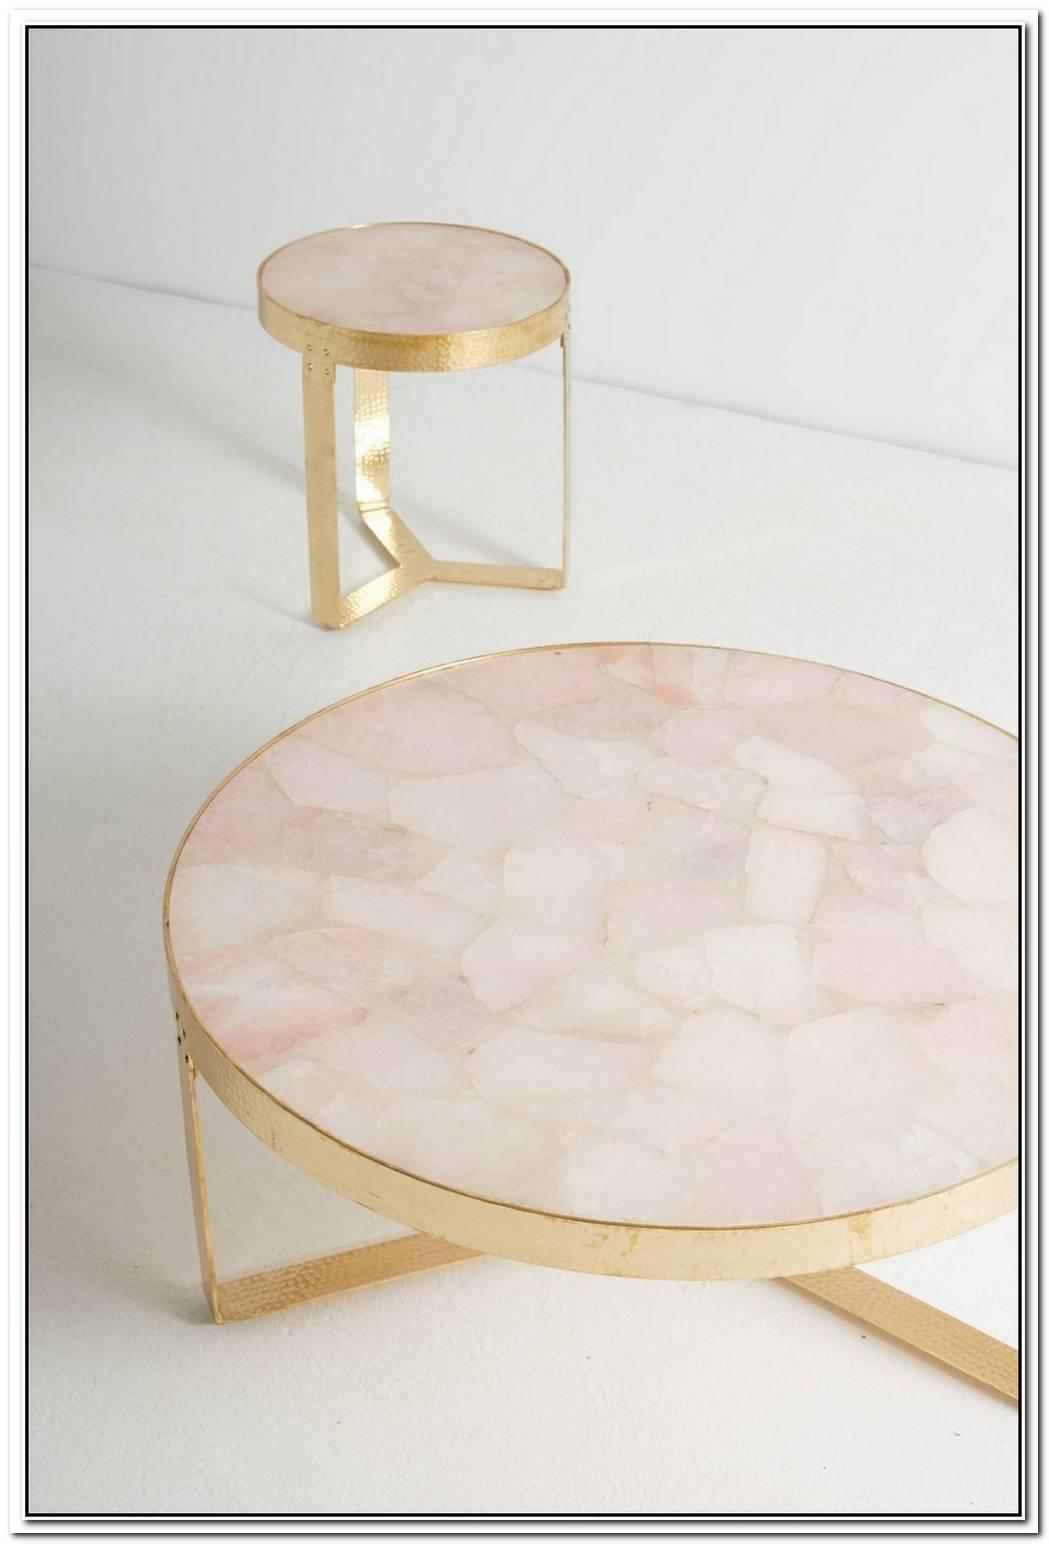 The Minimalist Tripod Side Table By Noon Studio